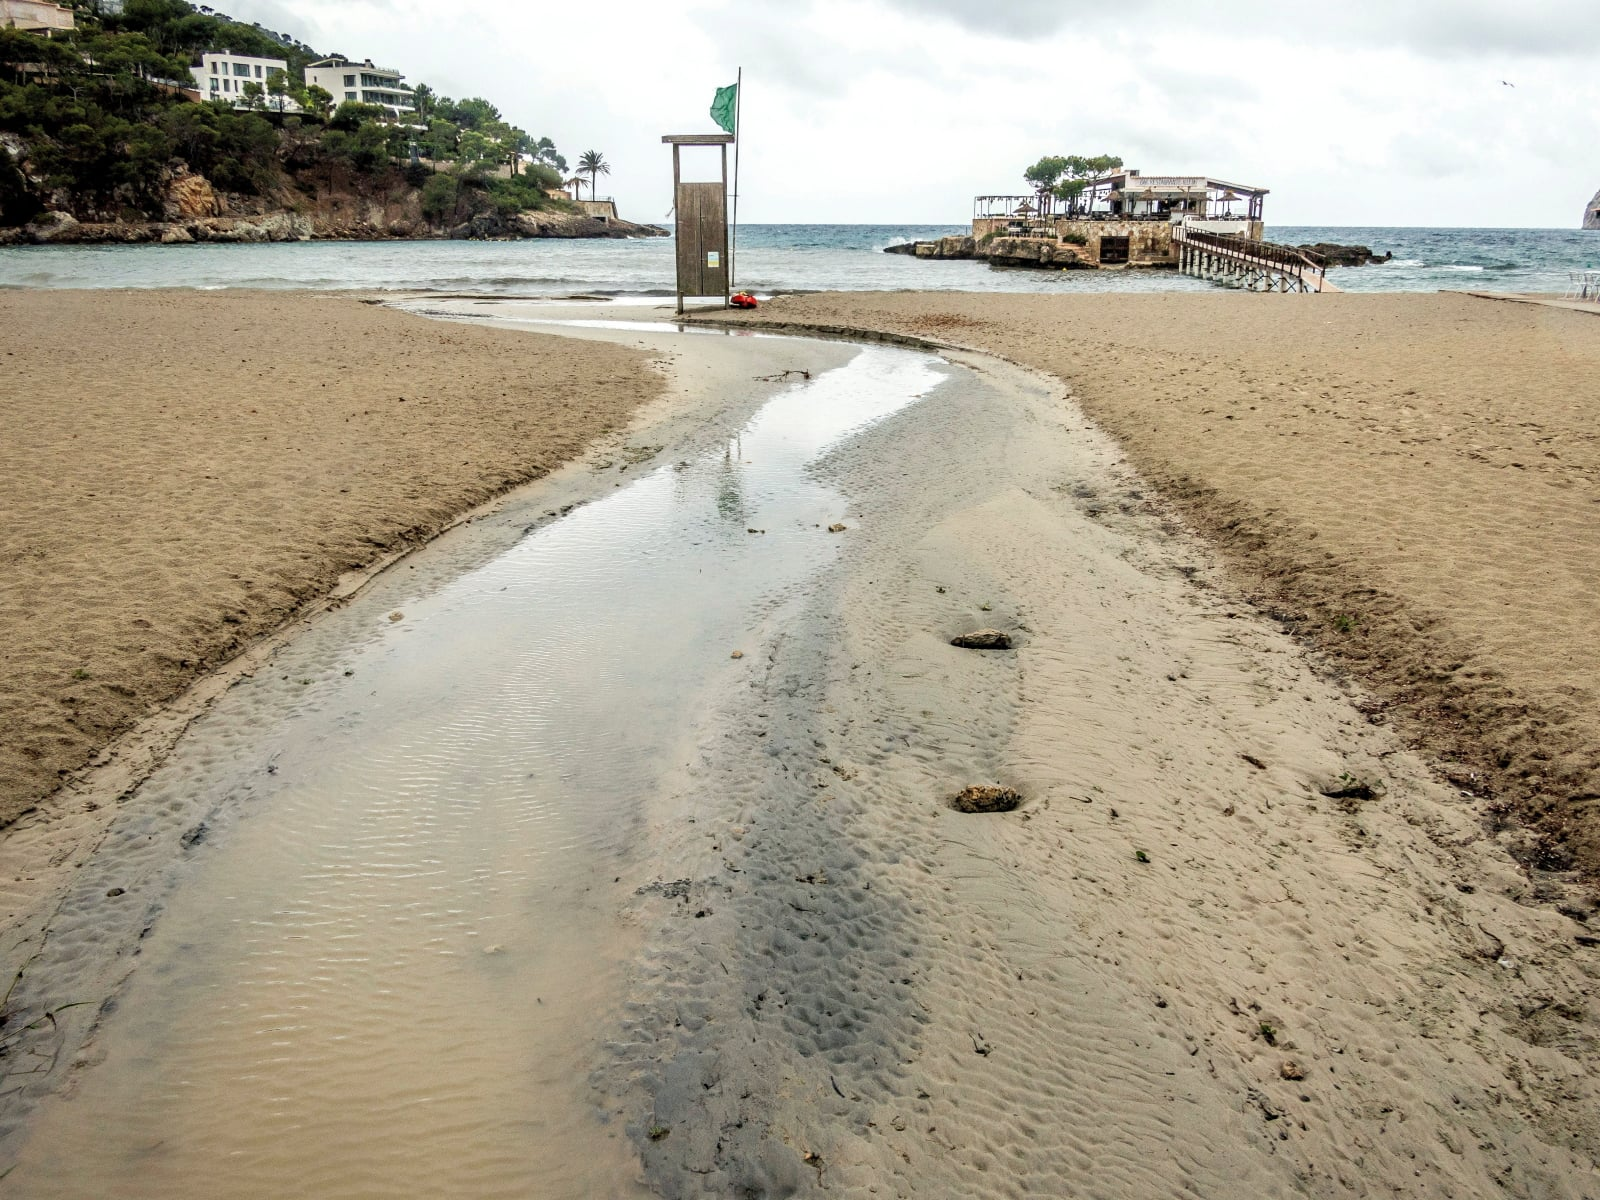 Pogoda w Hiszpanii fot. EPA/CATI CLADERA